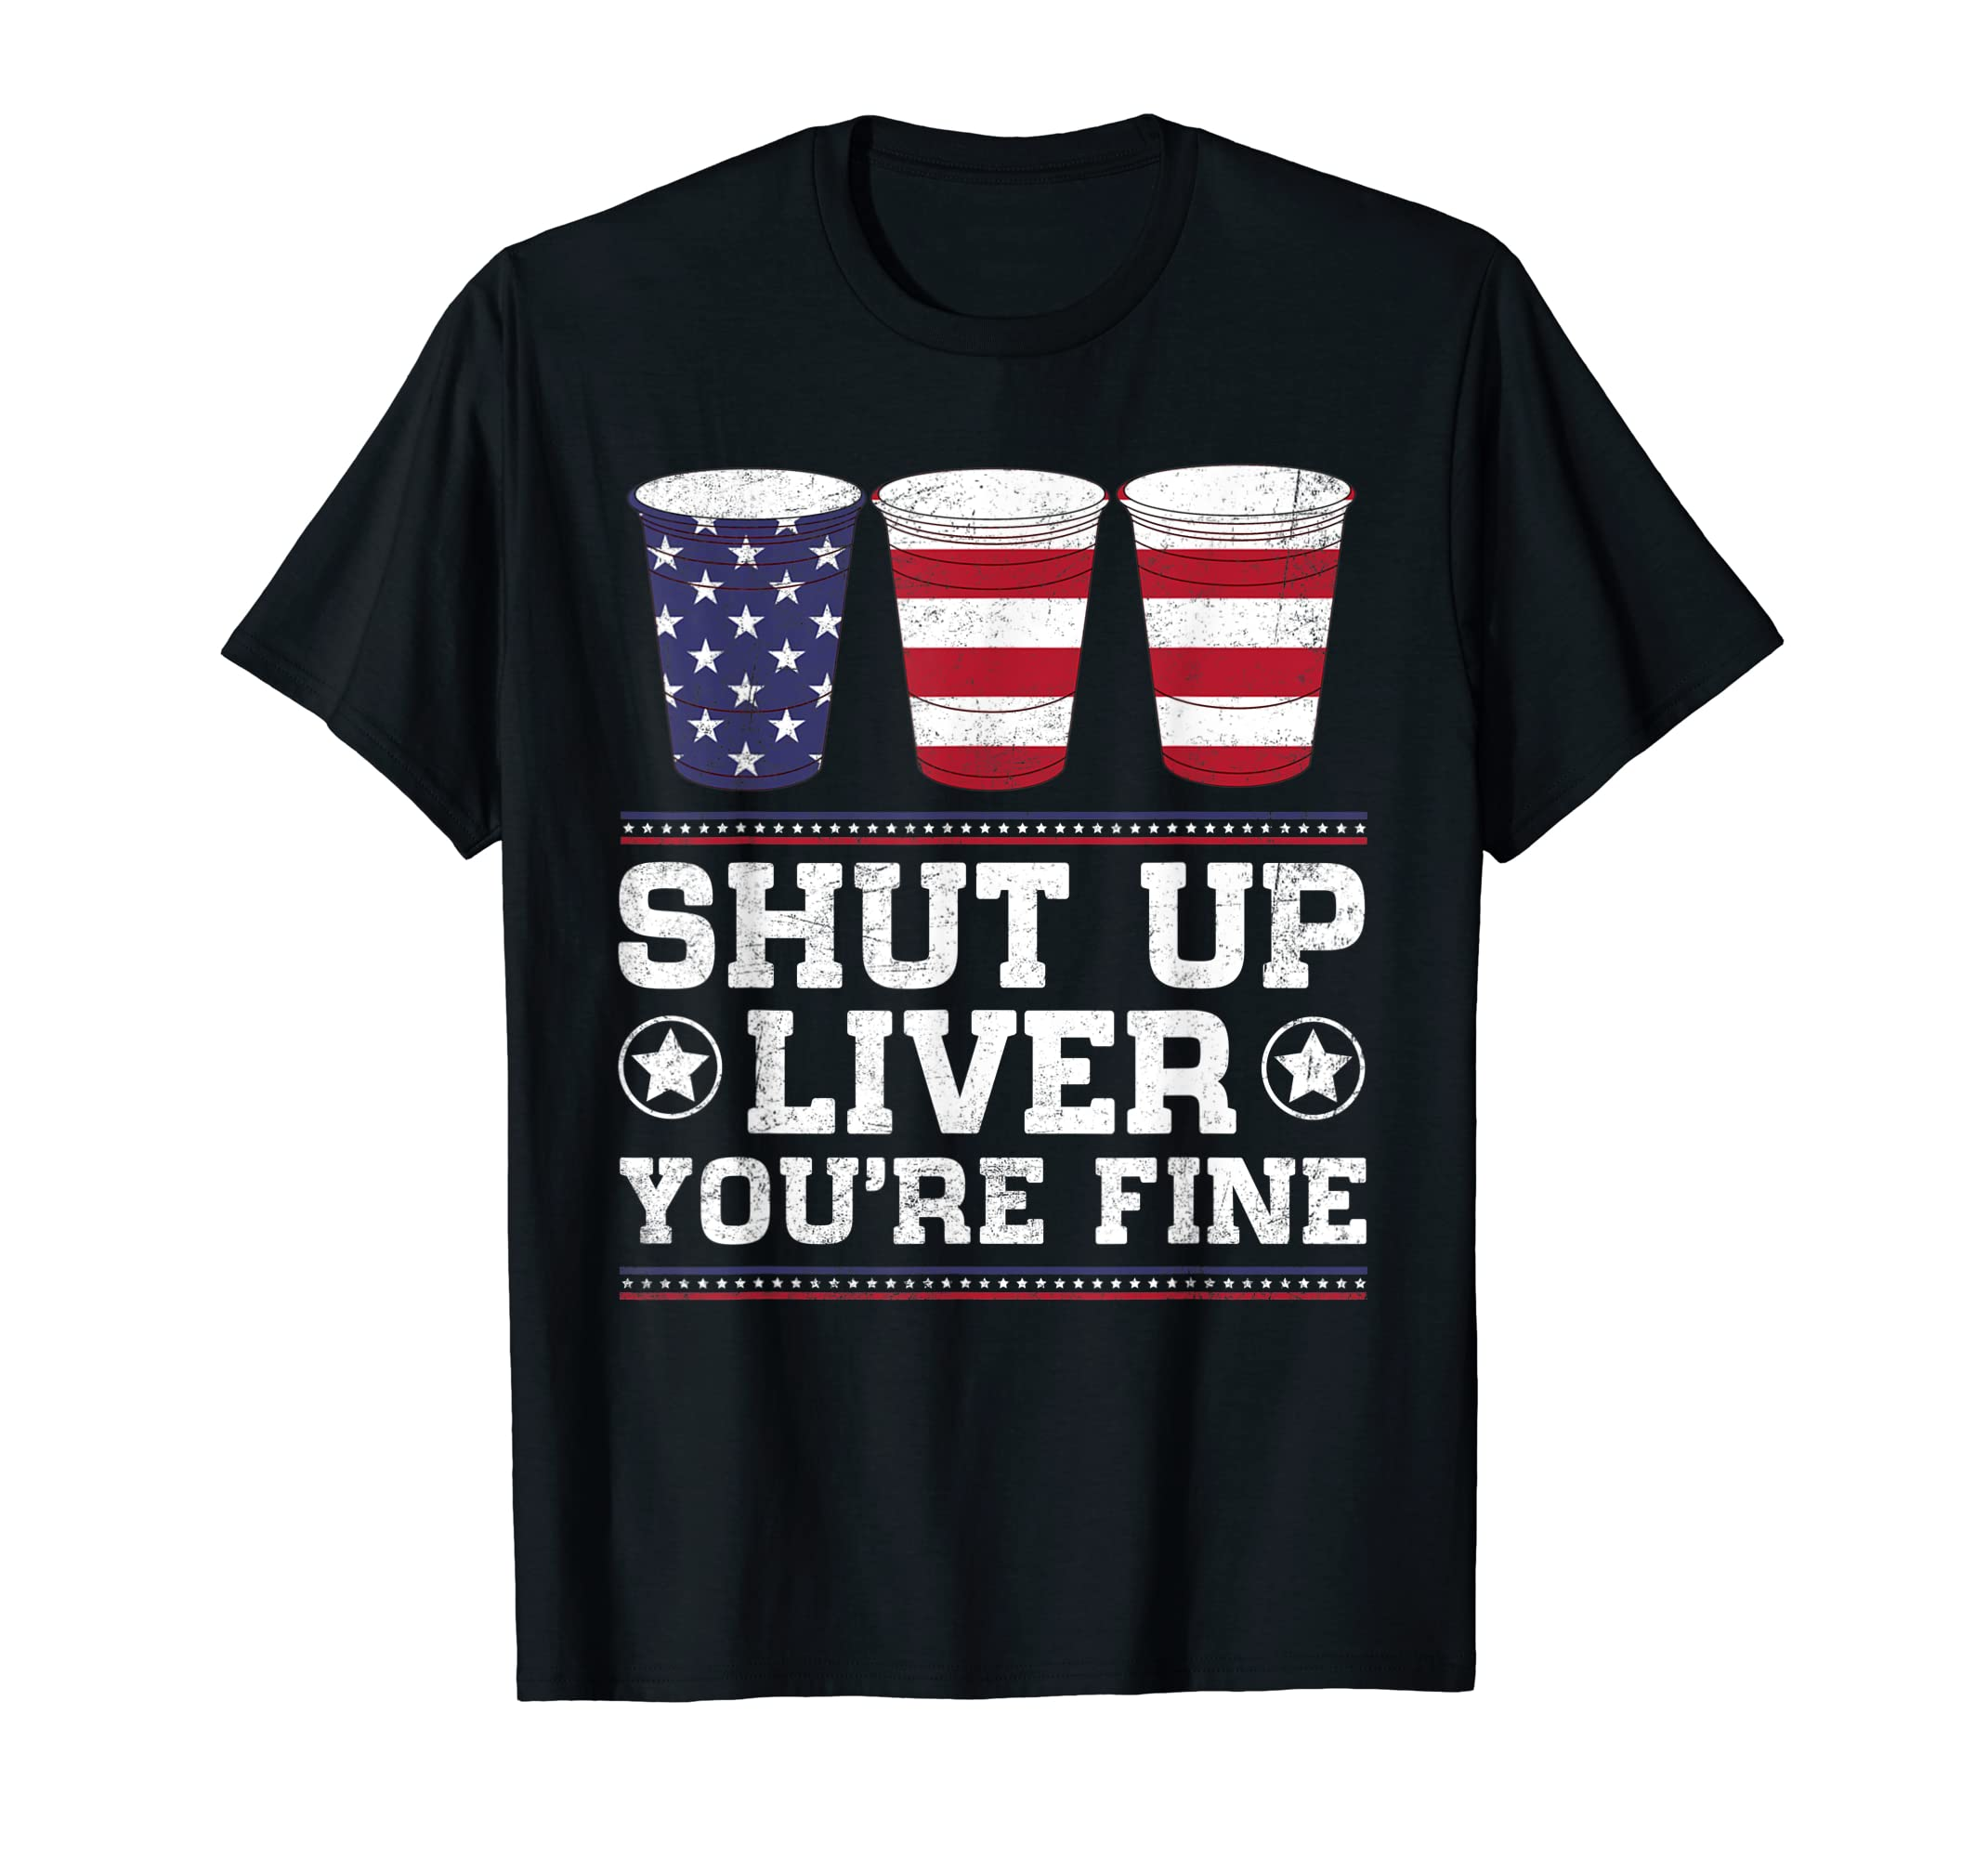 SHUT UP LIVER YOU'RE FINE 4th of July Beer Drinking Drunk-Men's T-Shirt-Black